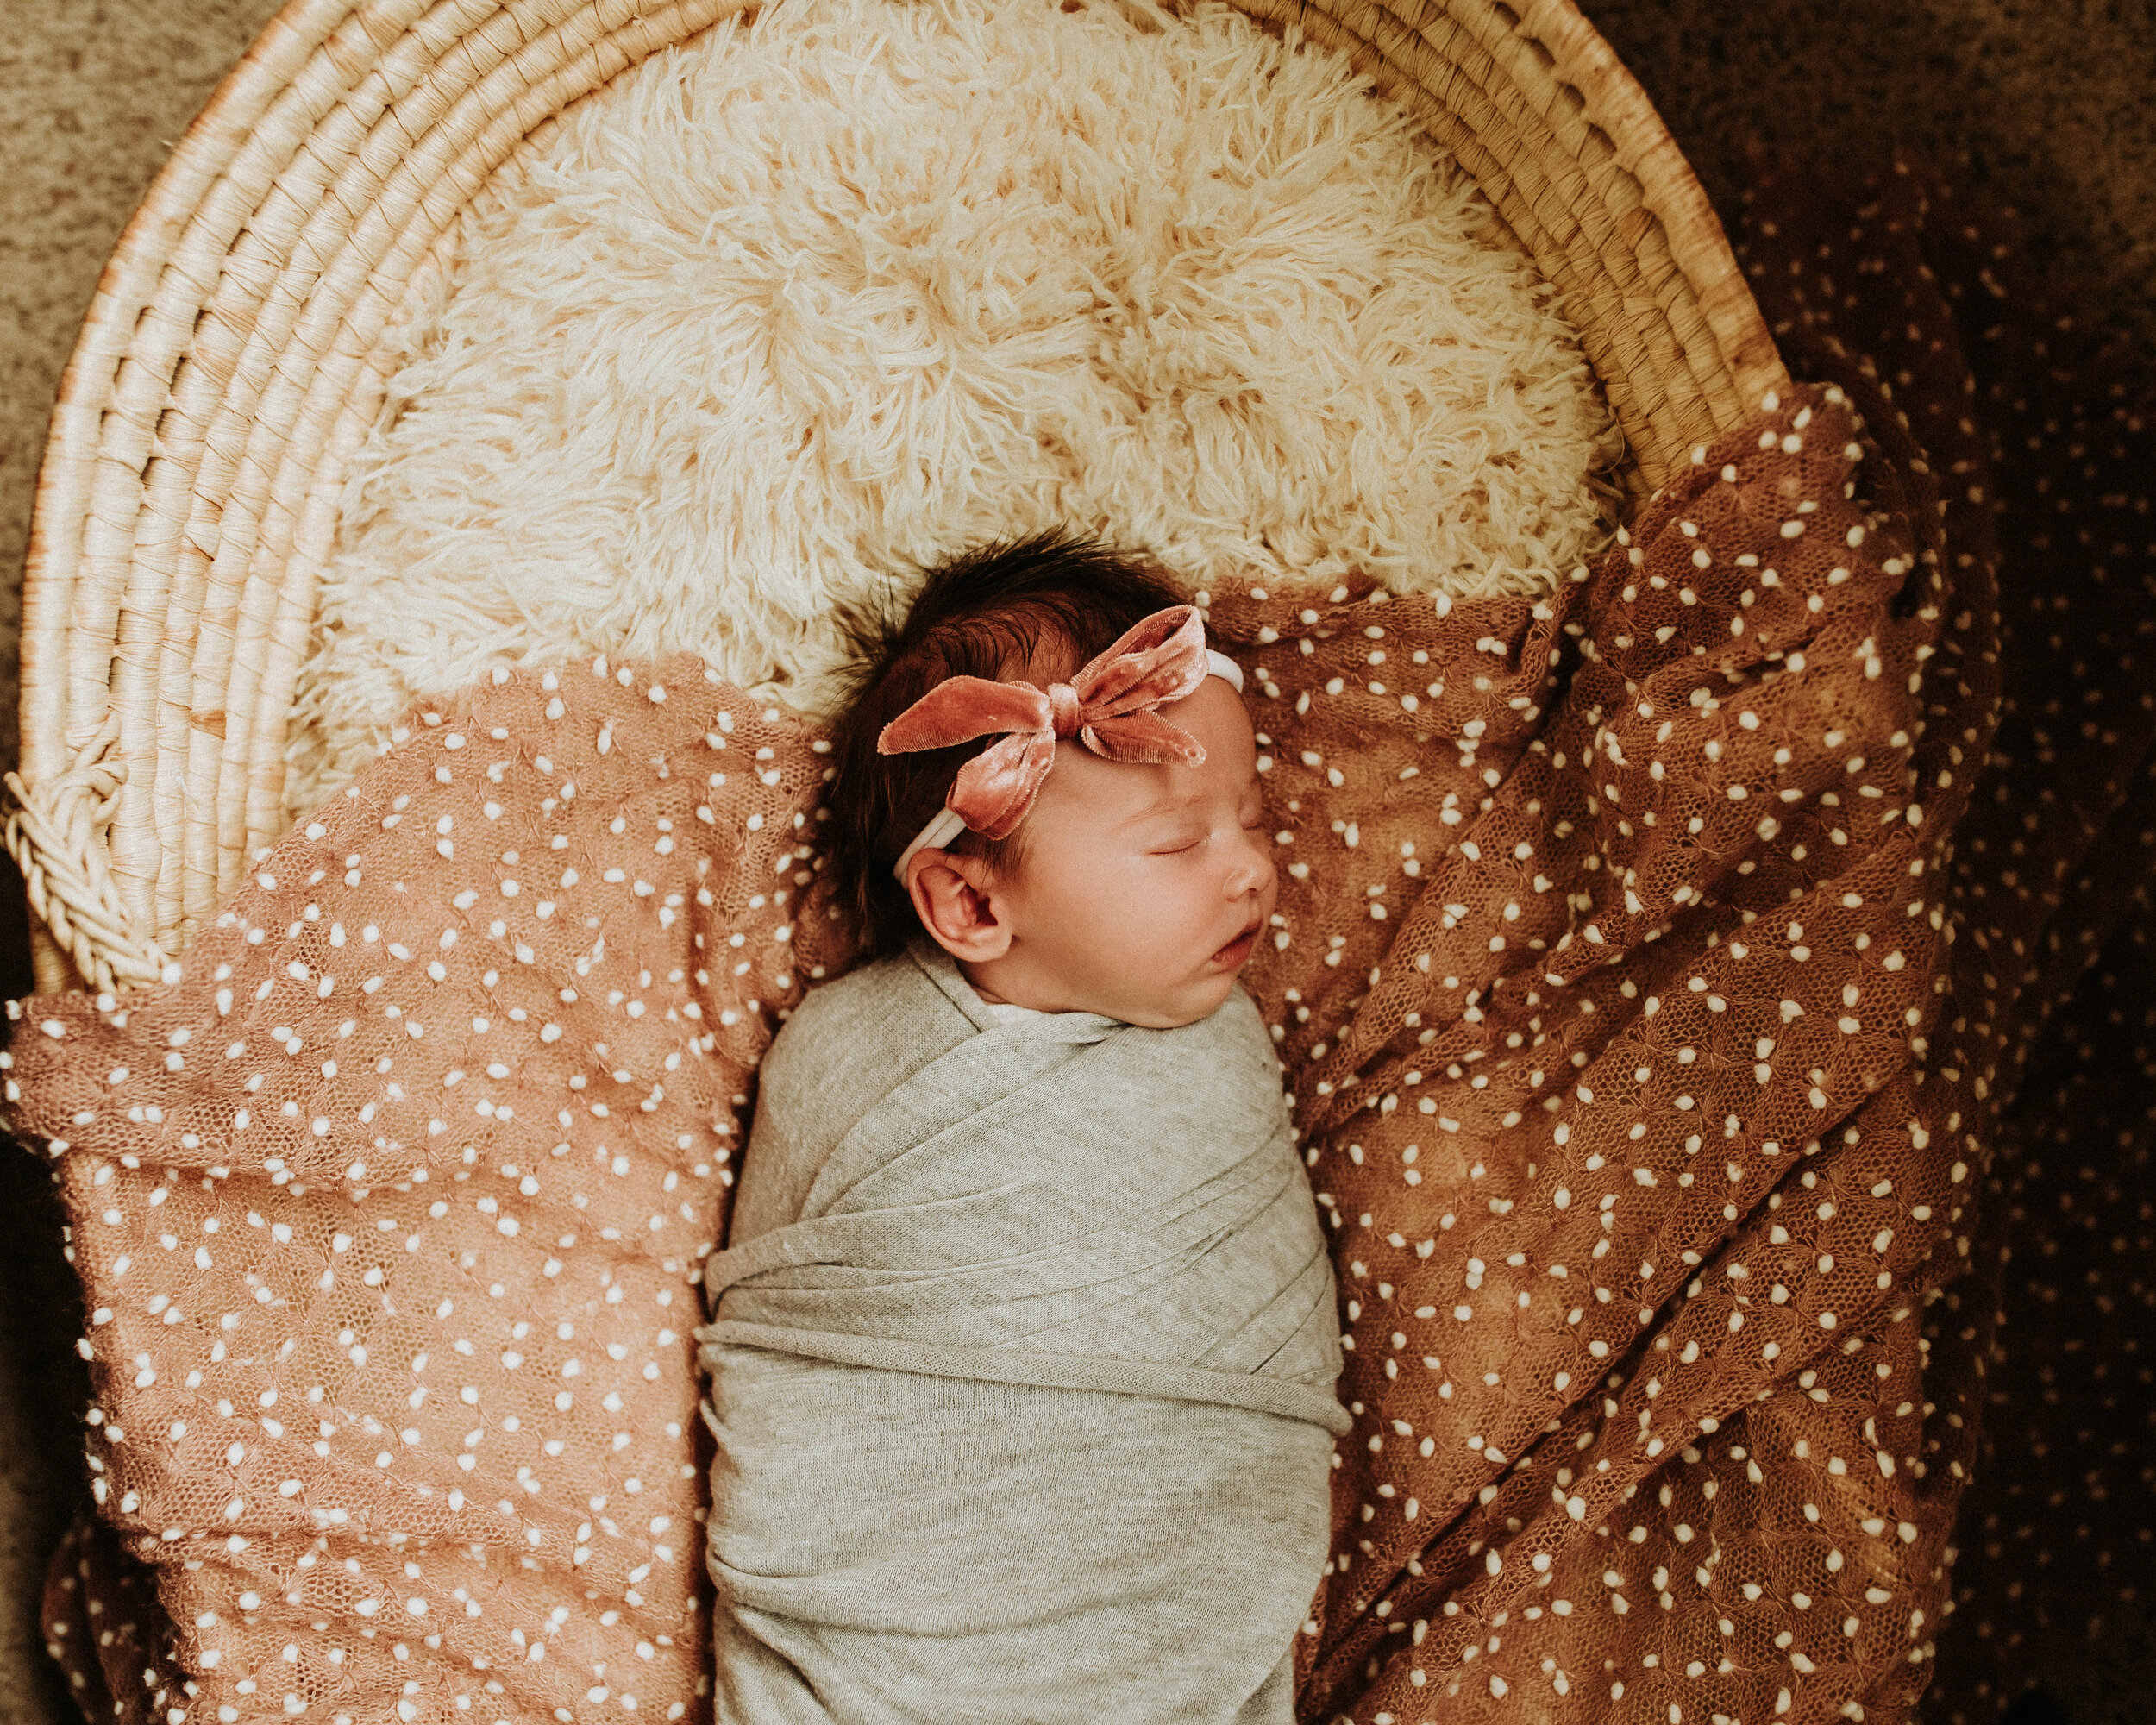 Newborn-Photographer-Bellingham-Wa-Brianne-Bell-Photography-(Dottie)-31.jpg